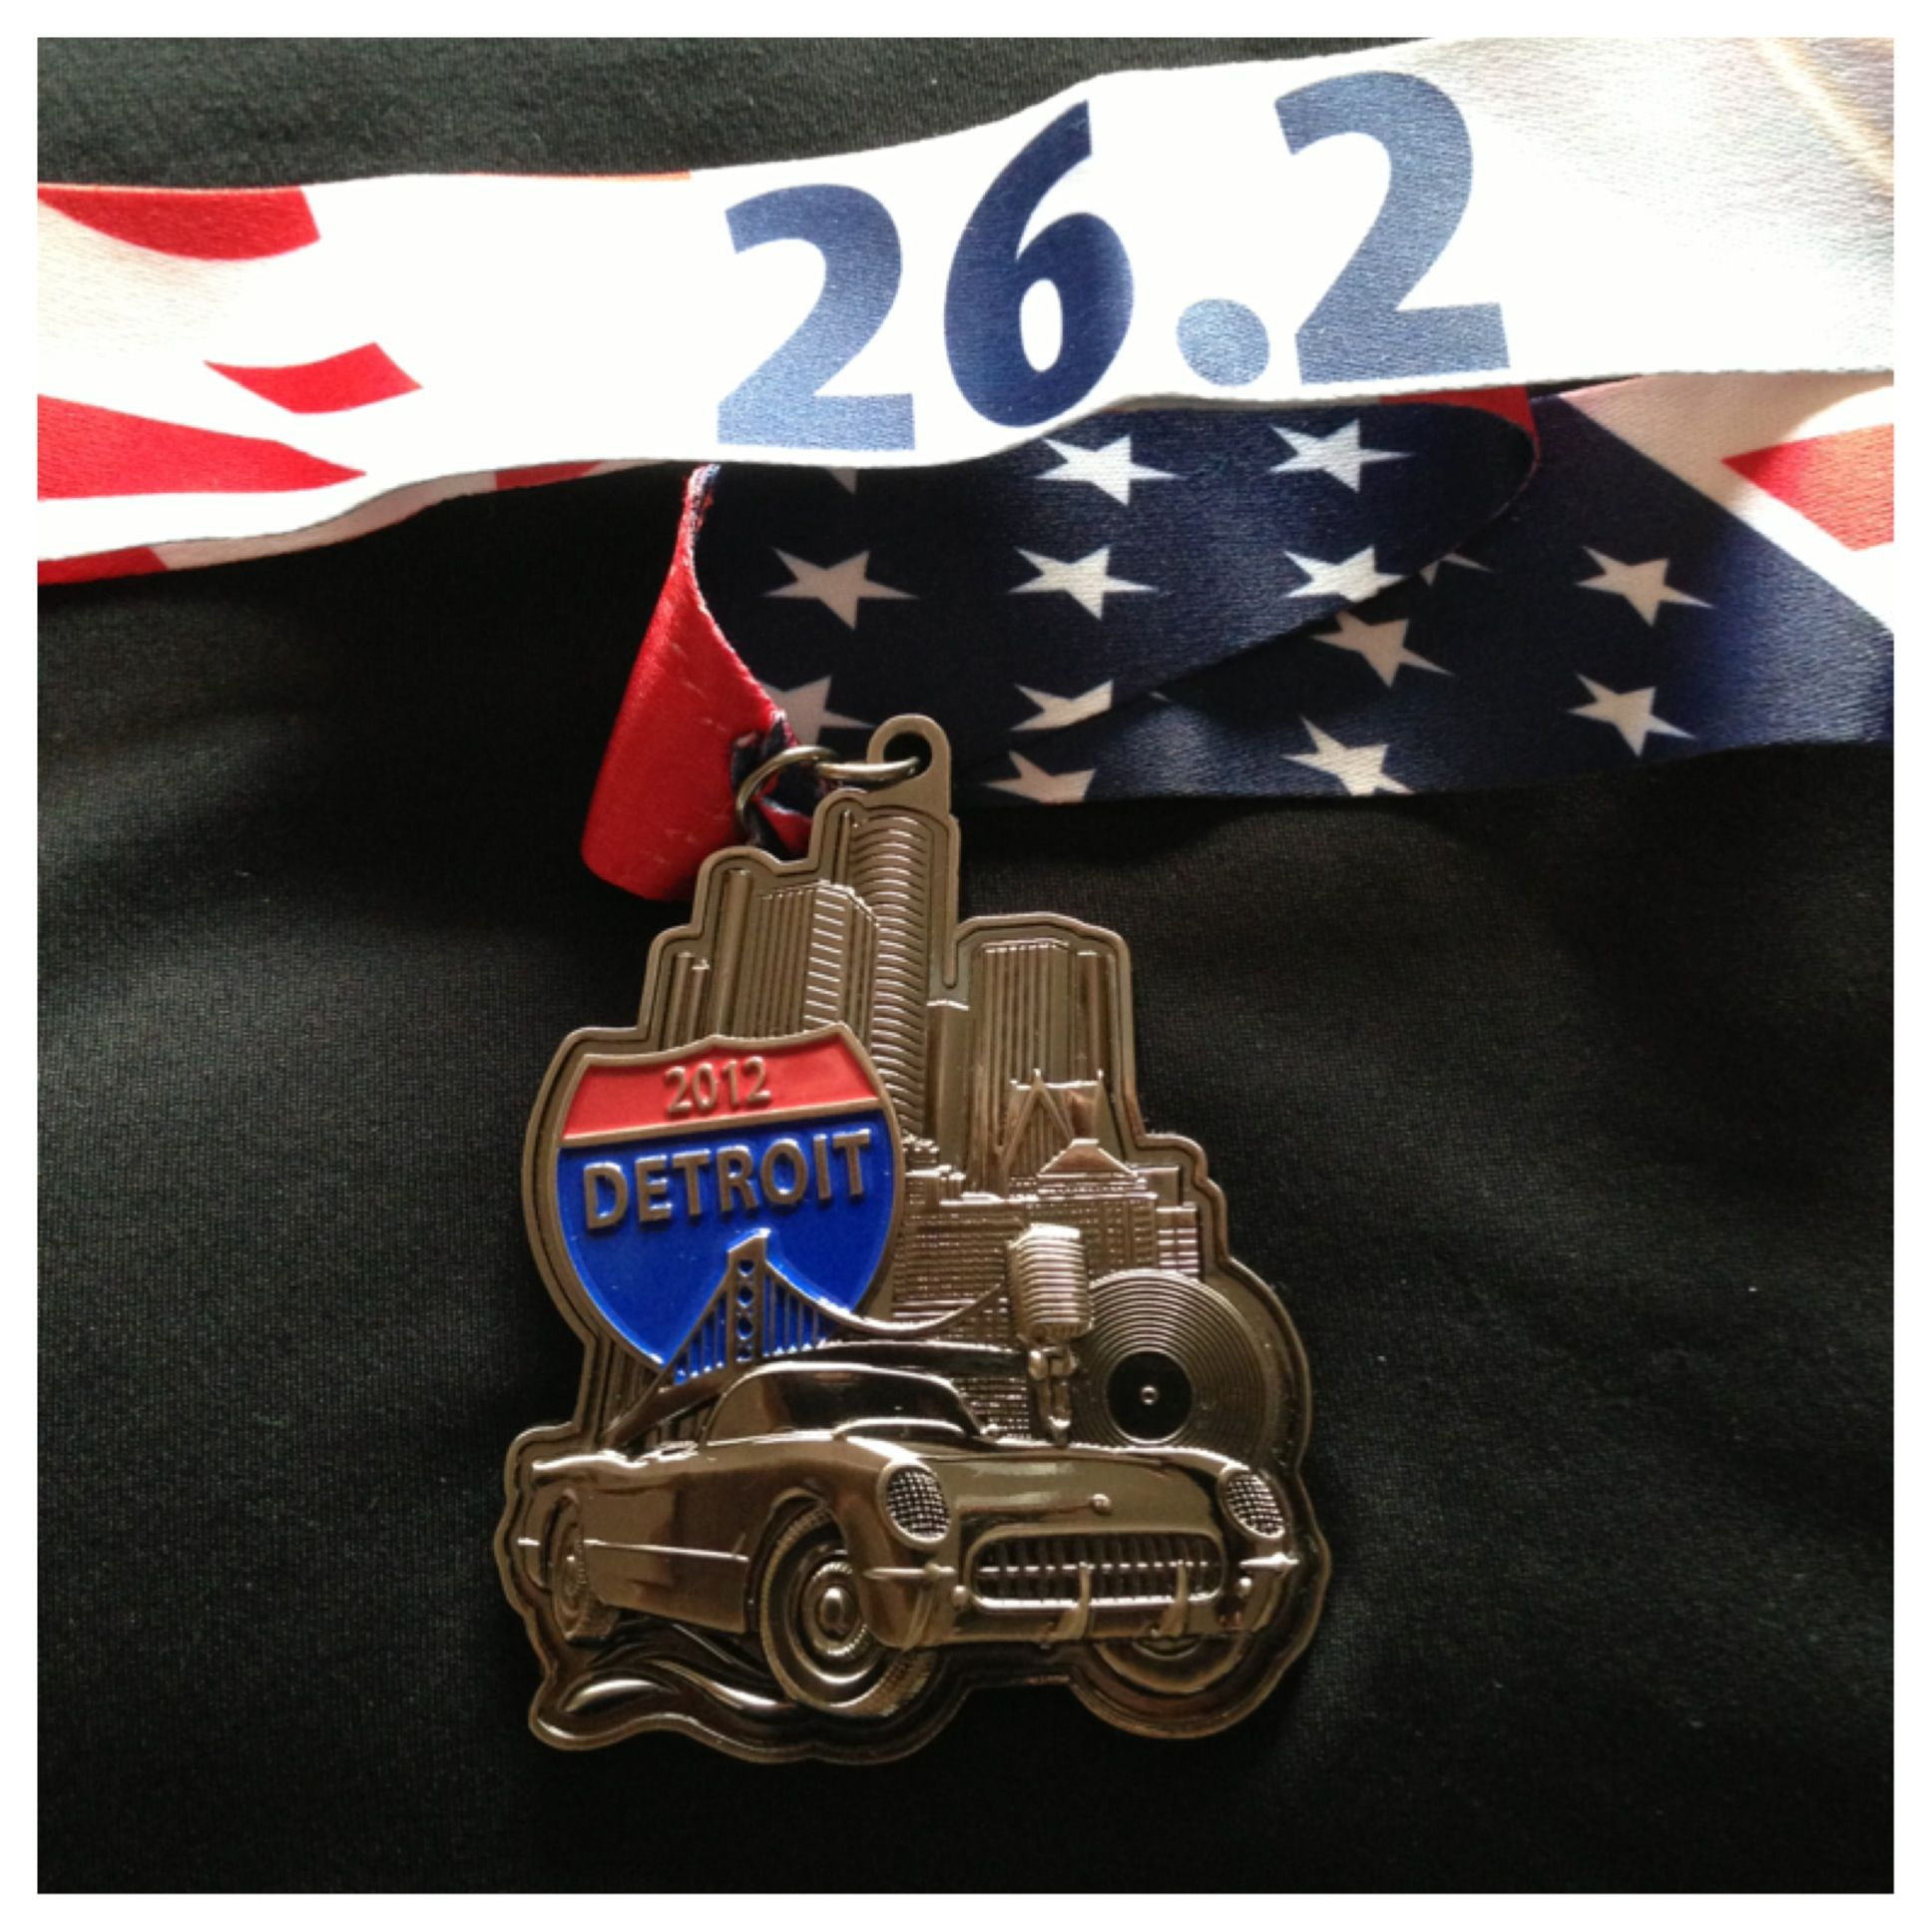 2012 Detroit Marathon Detroit Mi Usa Medallas Trofeos